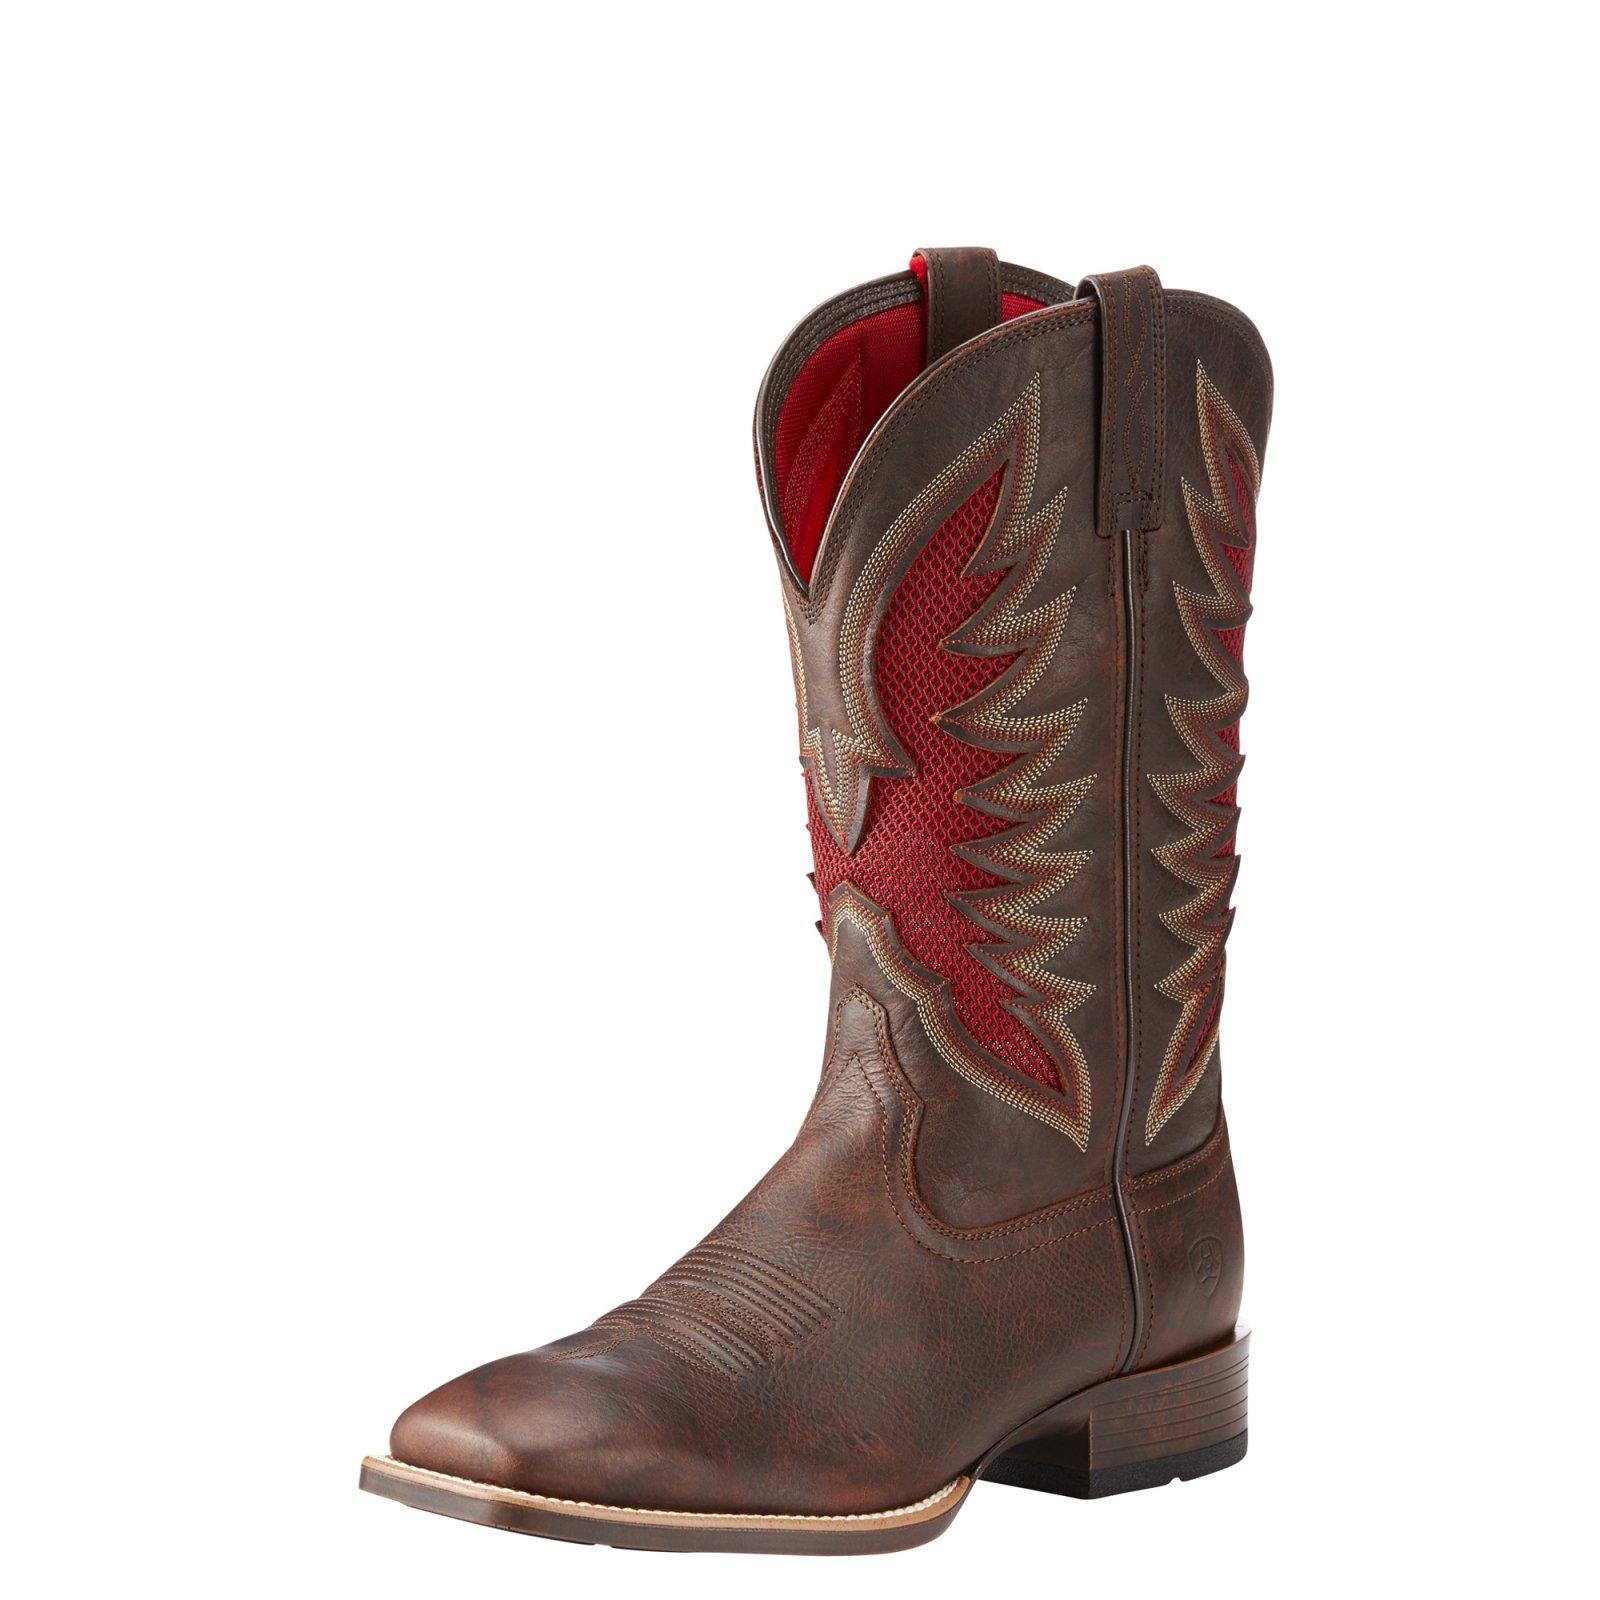 Men's VentTEK Ultra Boot from Ariat